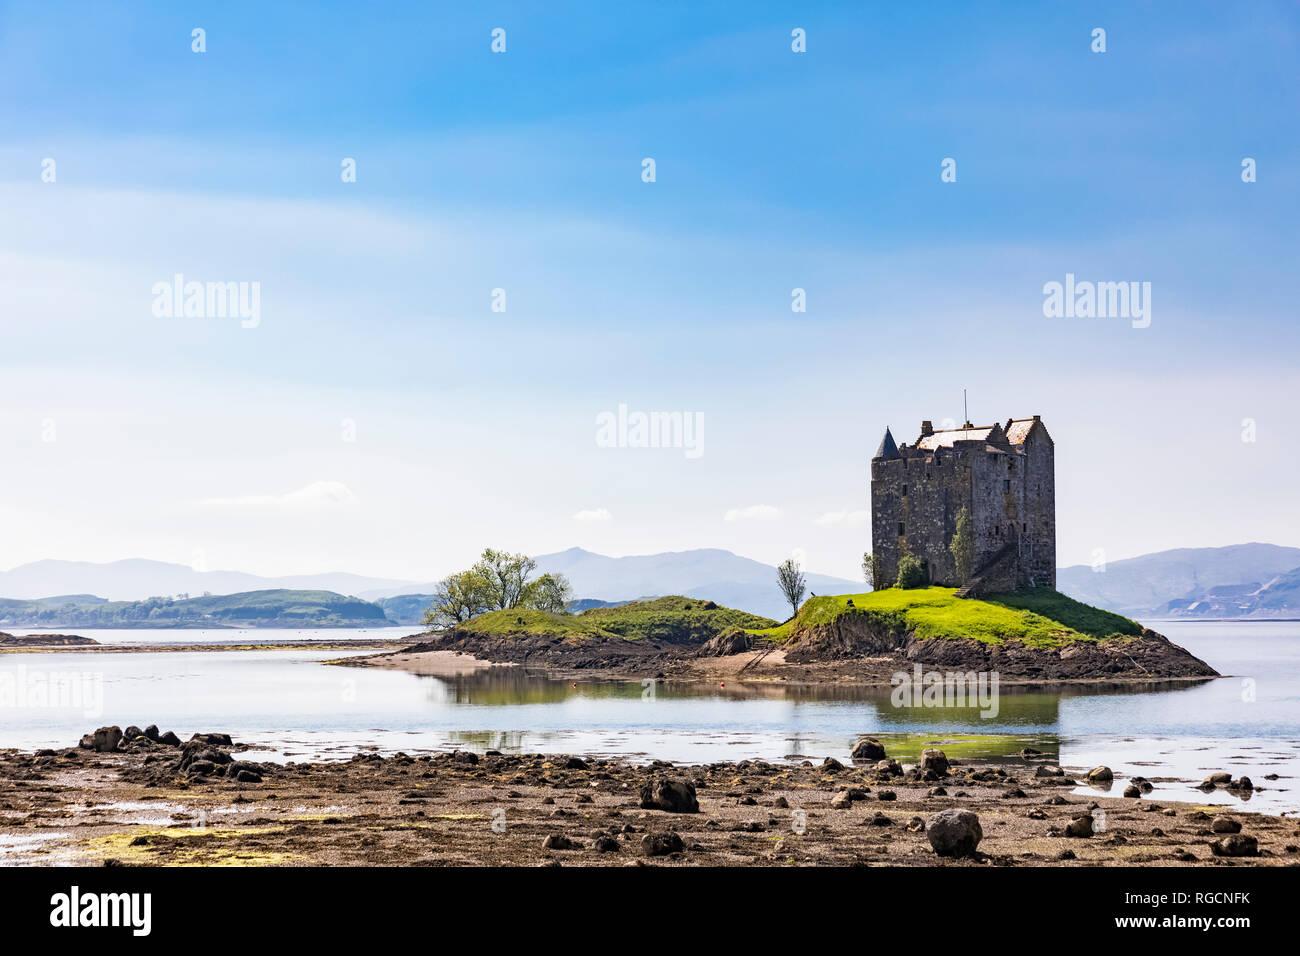 Great Britain, Scotland, Scottish Highlands, Glencoe, Castle Stalker, Loch Laich - Stock Image